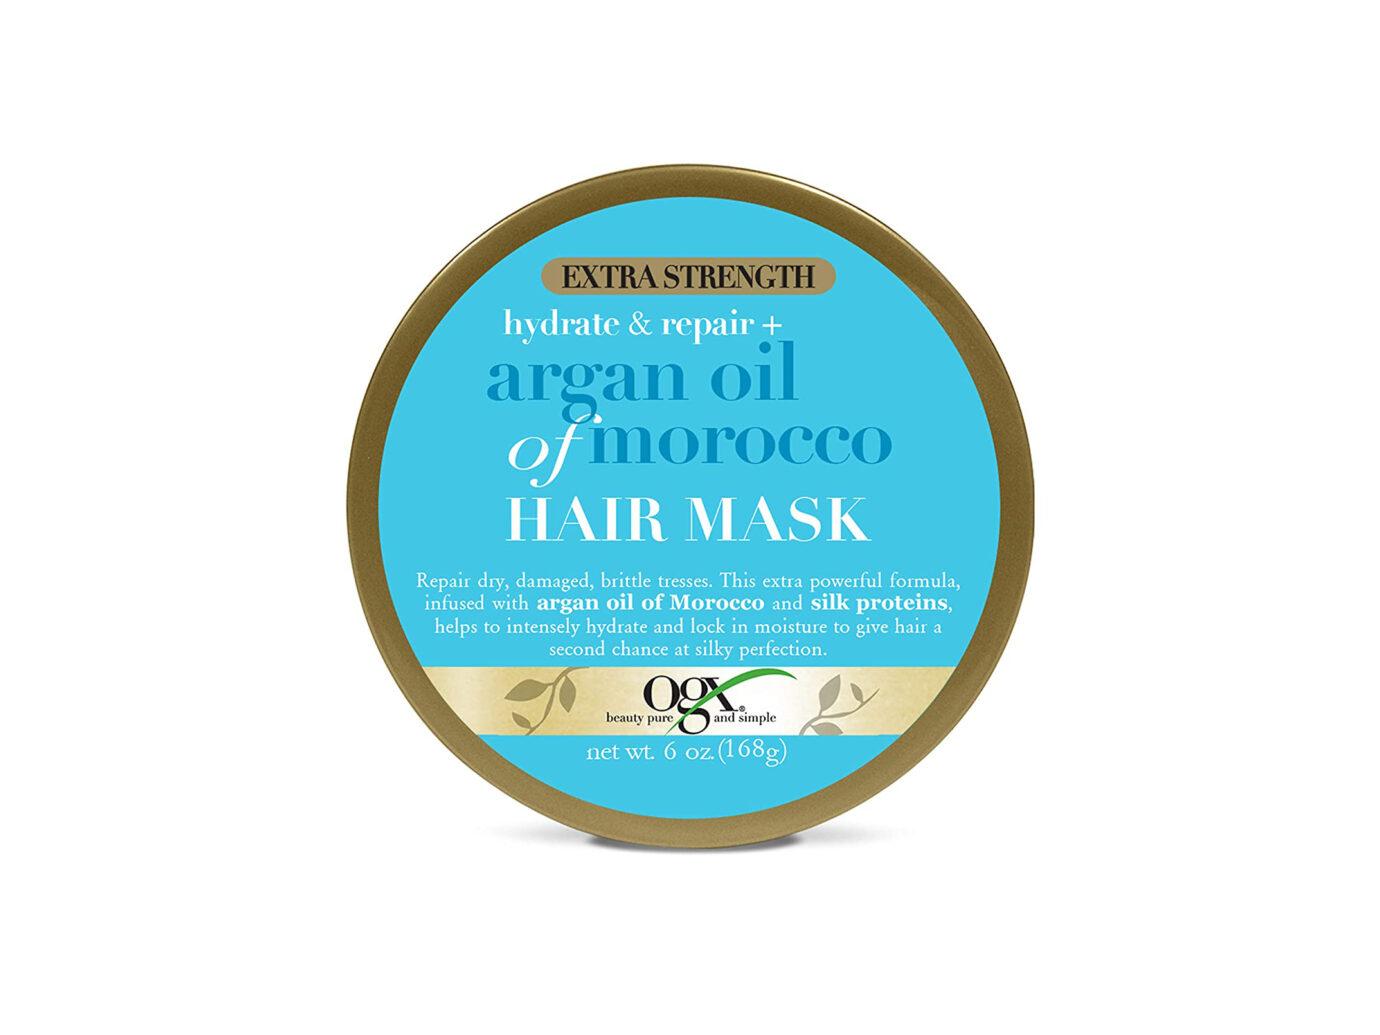 OGX Extra Strength Argan Oil Of Morocco Hair Mask